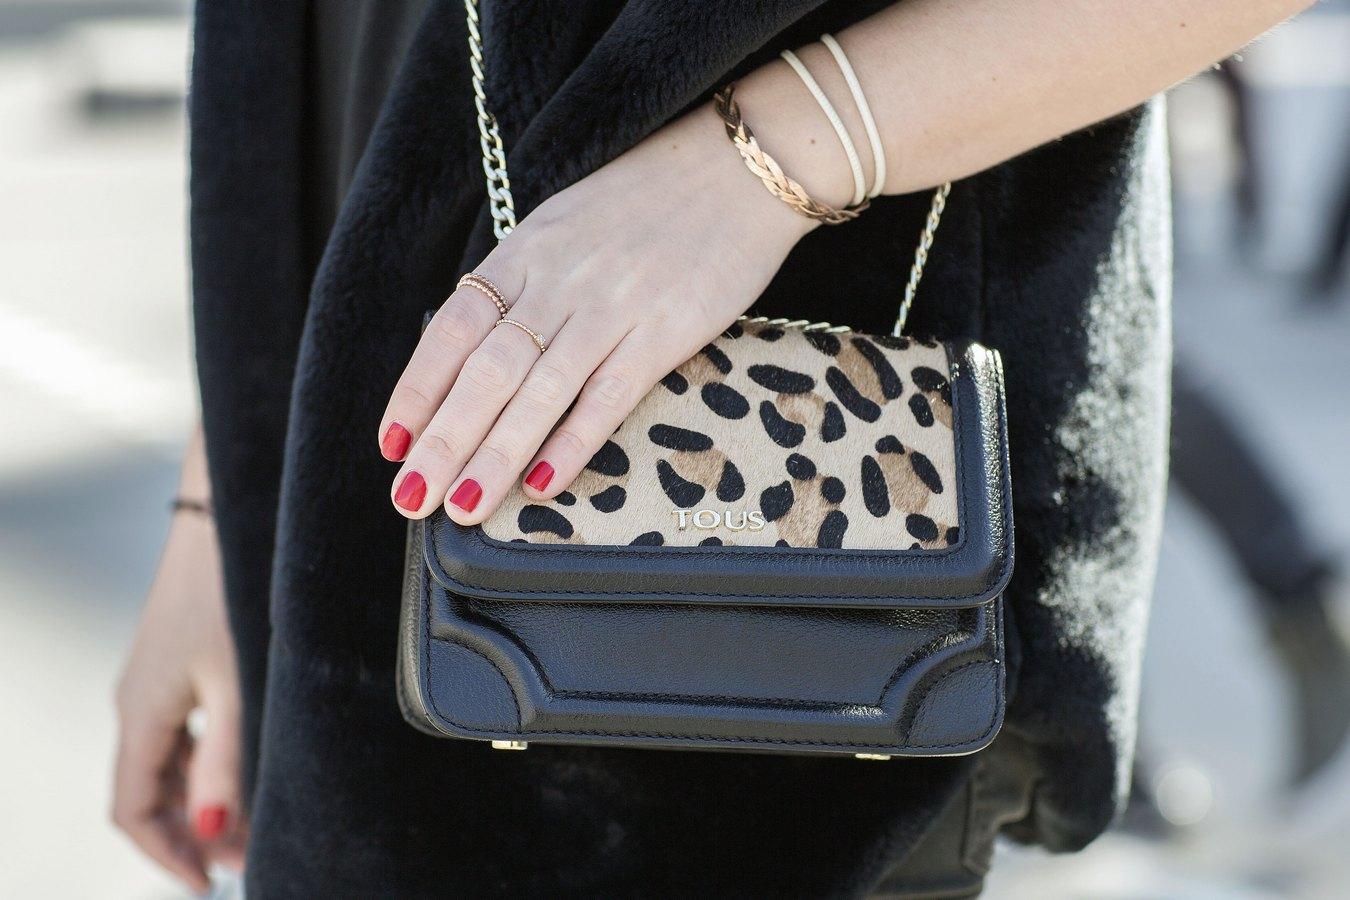 Blog mode femme Paris - Du style, Madame - Streetstyle - vintage - fourrure